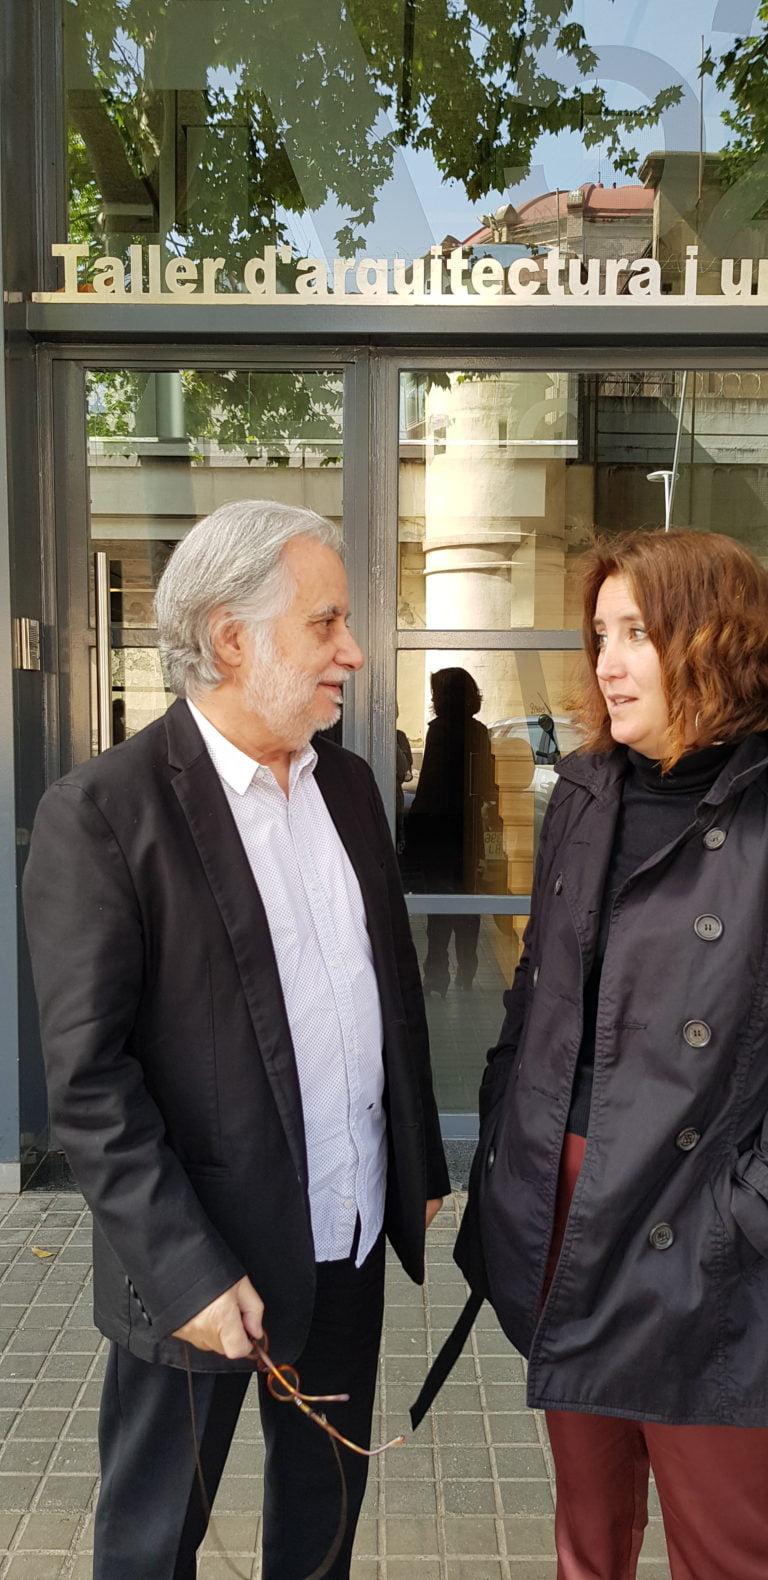 Pere González Nebreda y Eva González-Nebreda